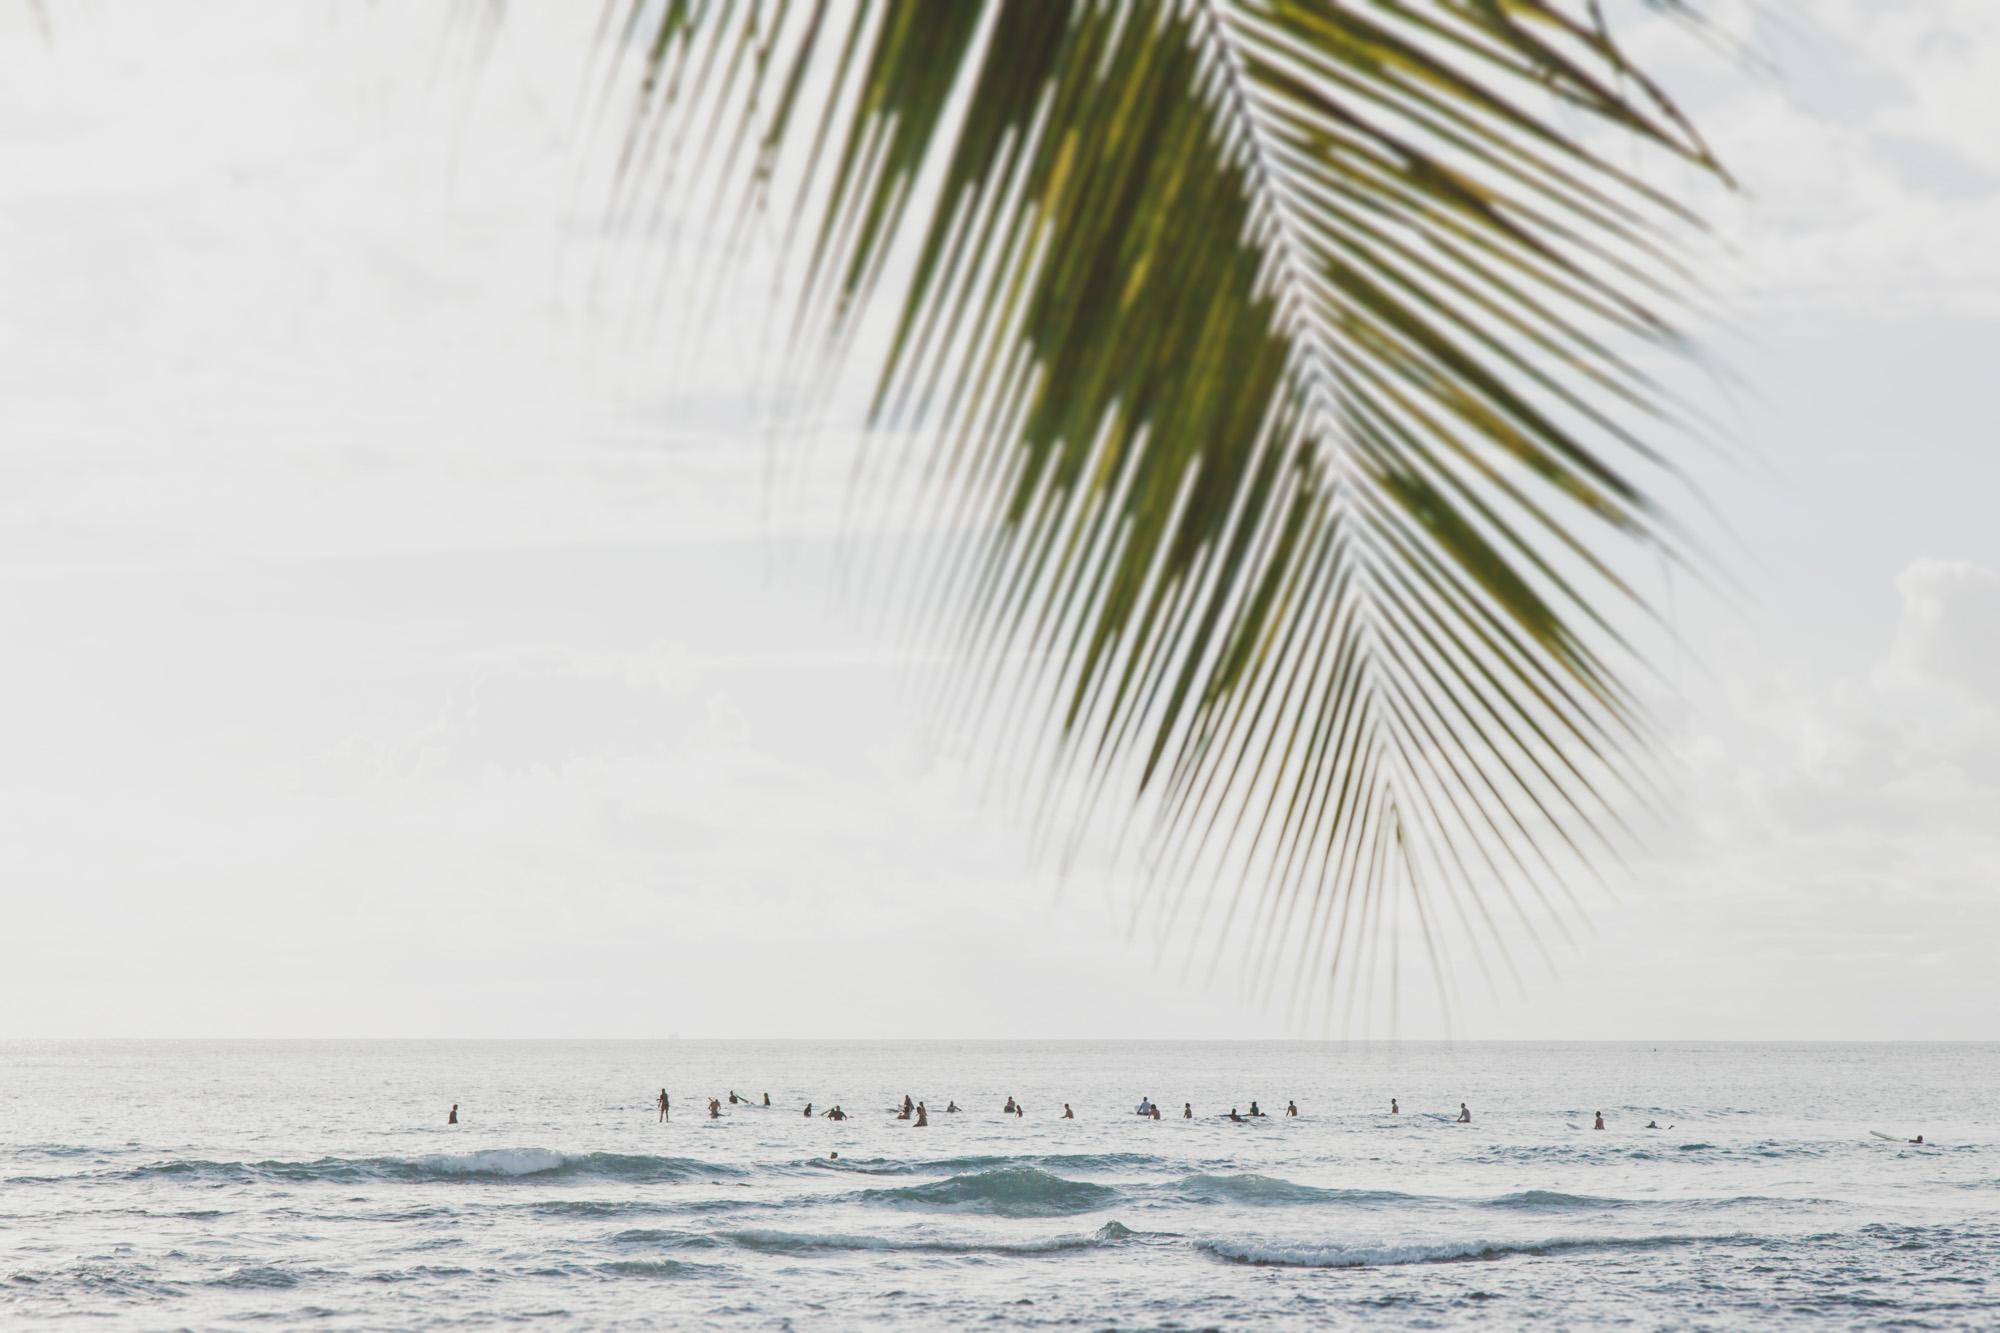 Hawaii stocksy 18_1.jpg